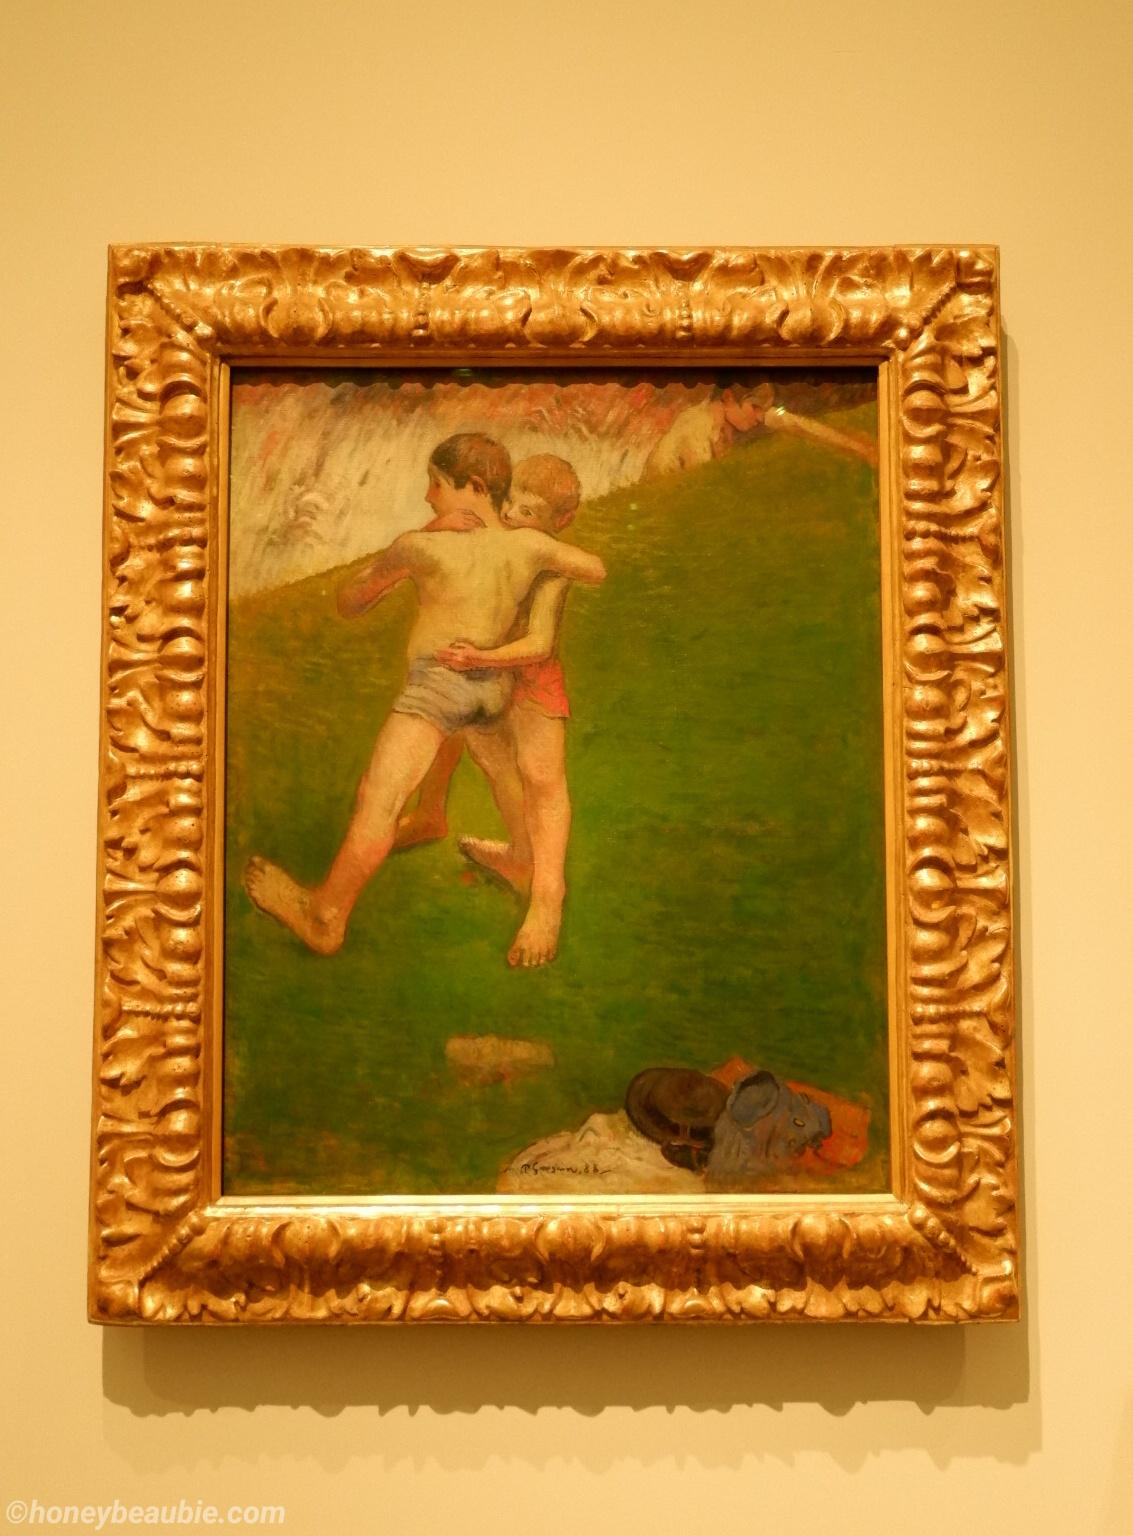 painting-paul-gaugin-exhibited-louvre-museum-abu-dhabi